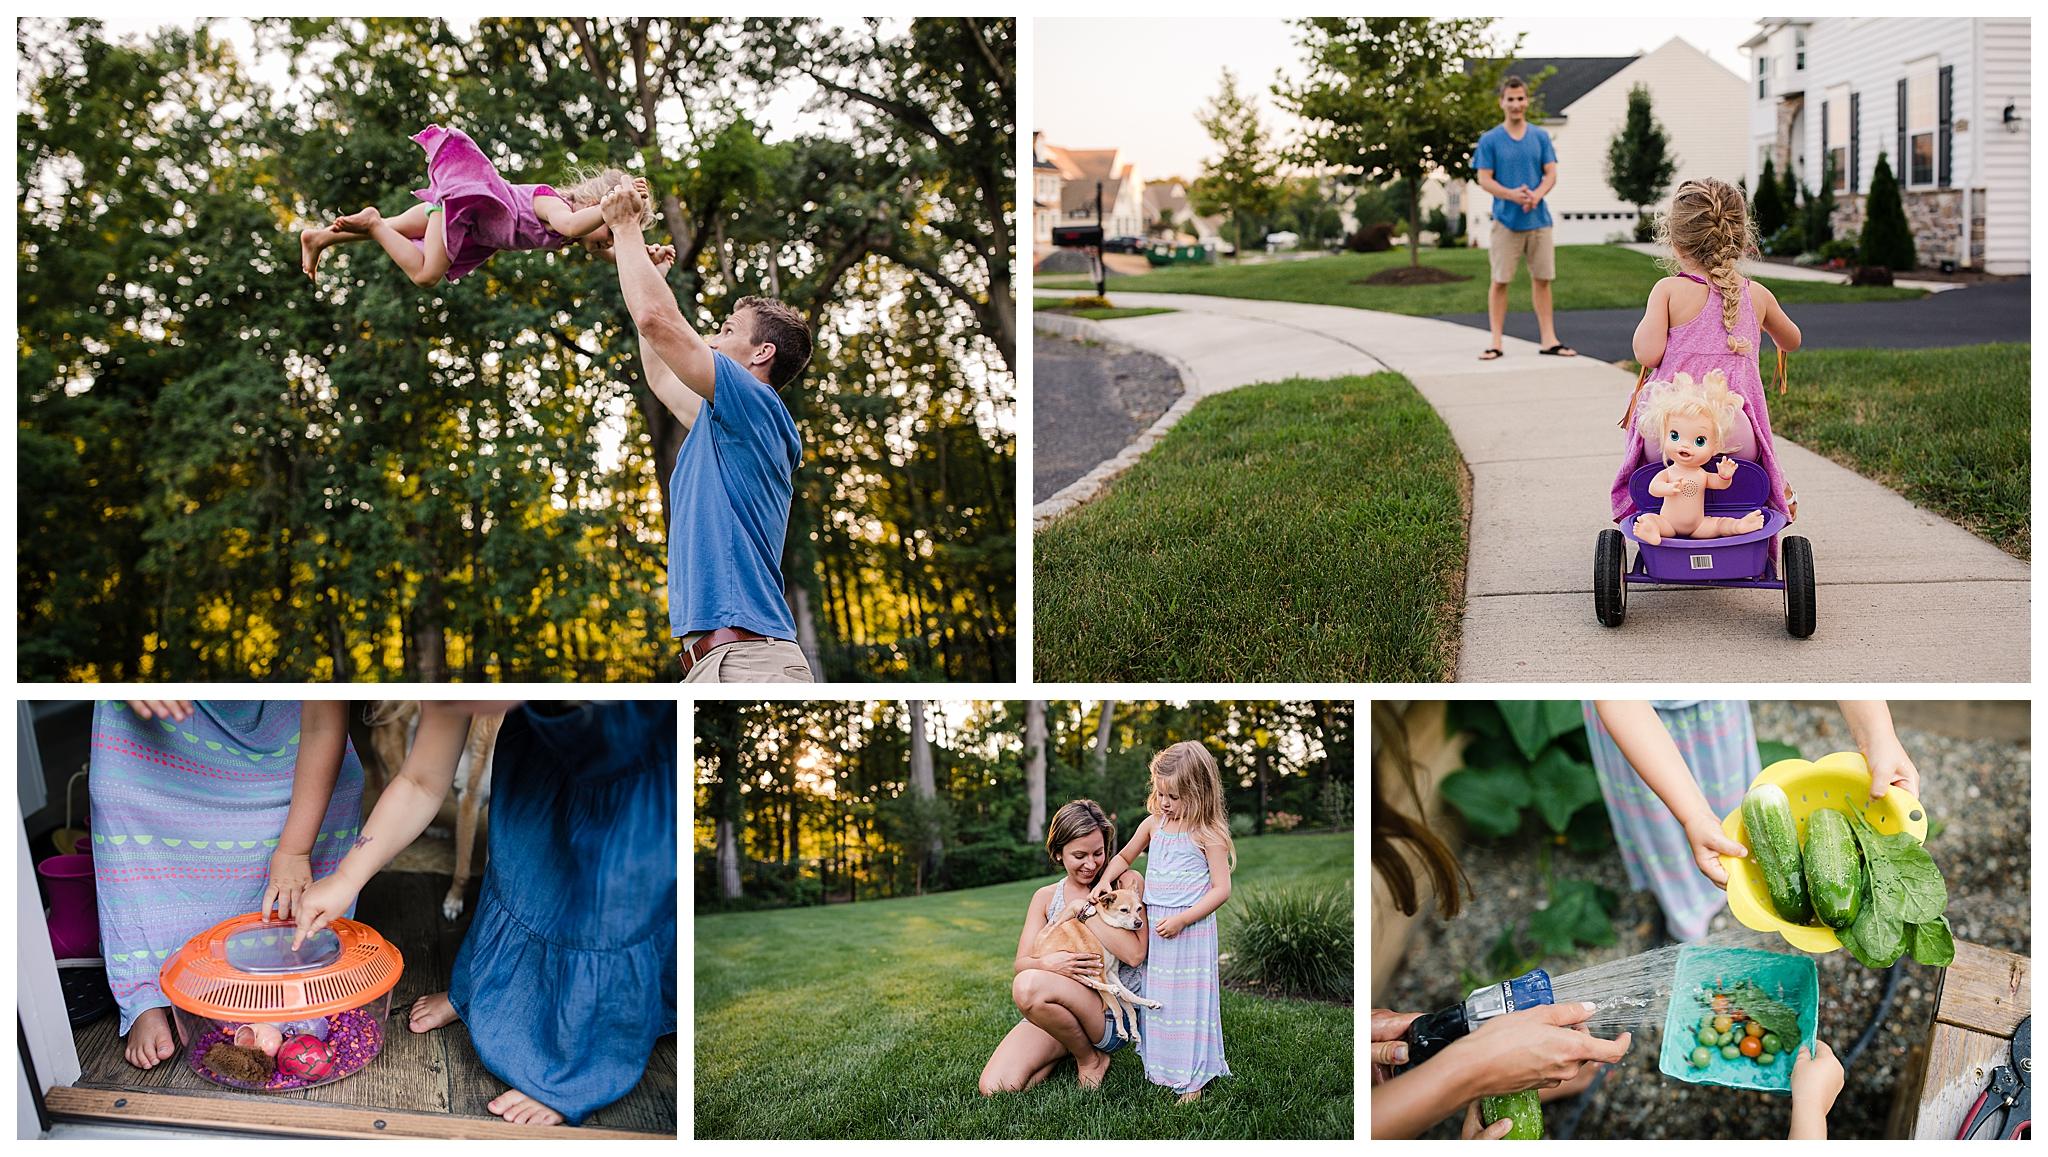 AnneMarie_Hamant_family_photographer_lehigh_valley_pa_0158.jpg